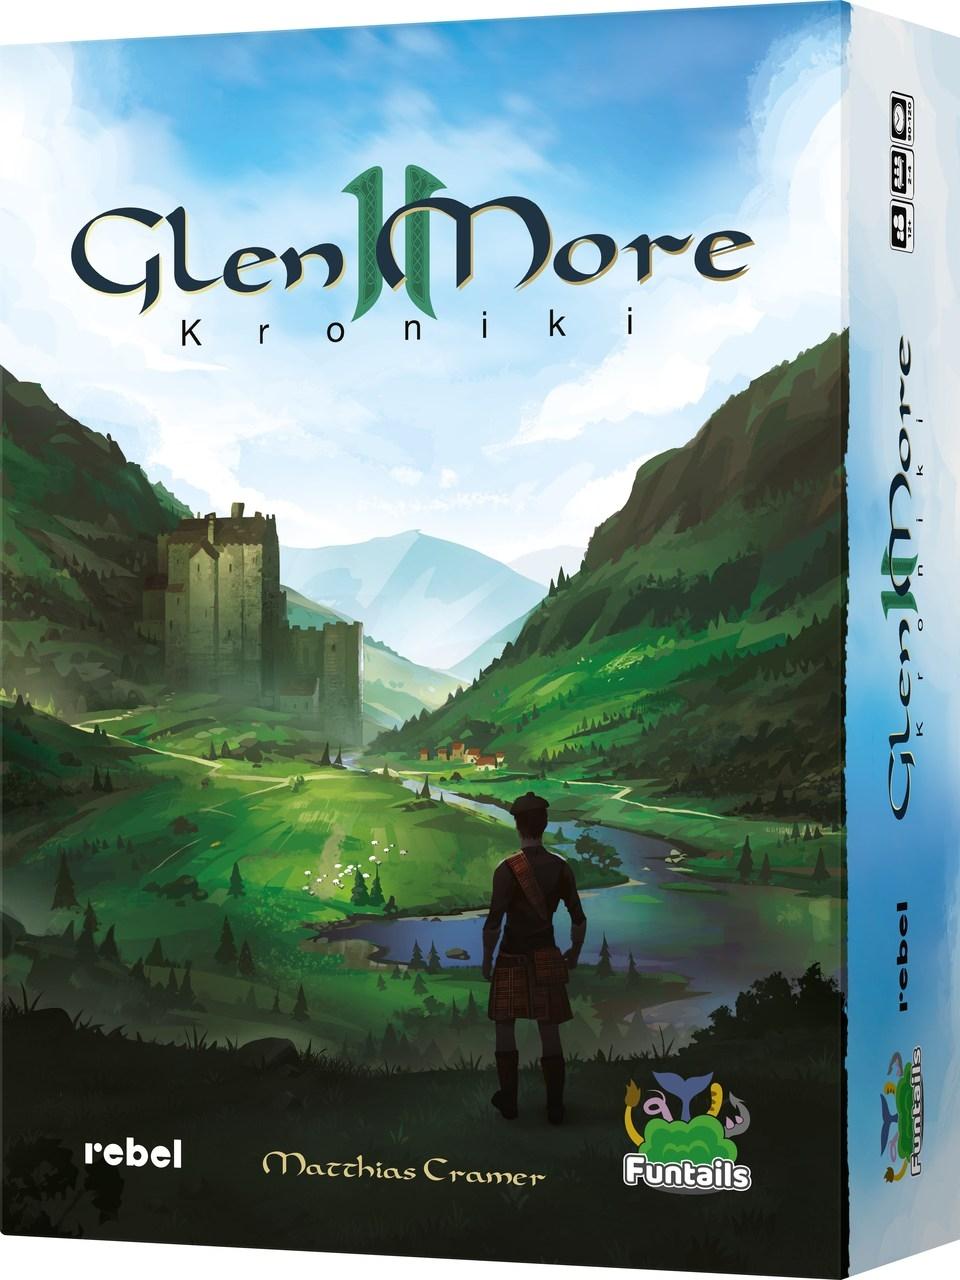 Glen More II: Kroniki (przedsprzedaż)